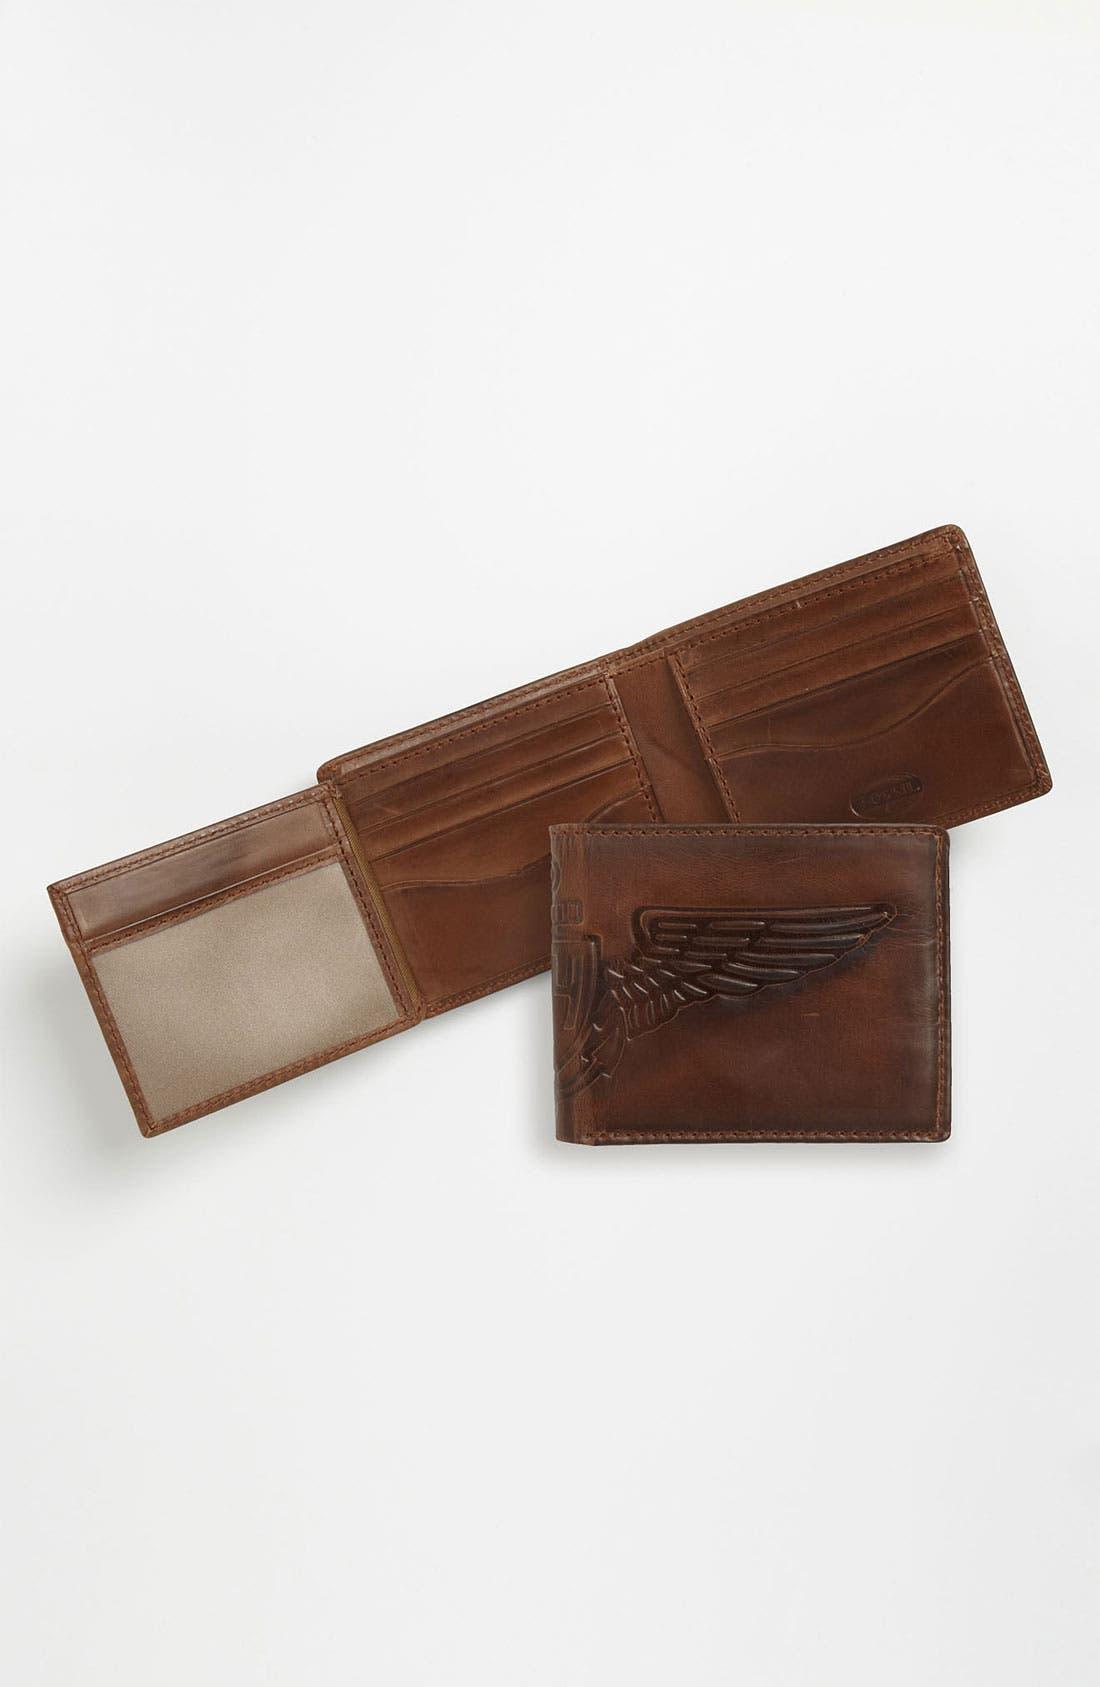 Alternate Image 1 Selected - Fossil 'Flatiron Traveler' Wallet